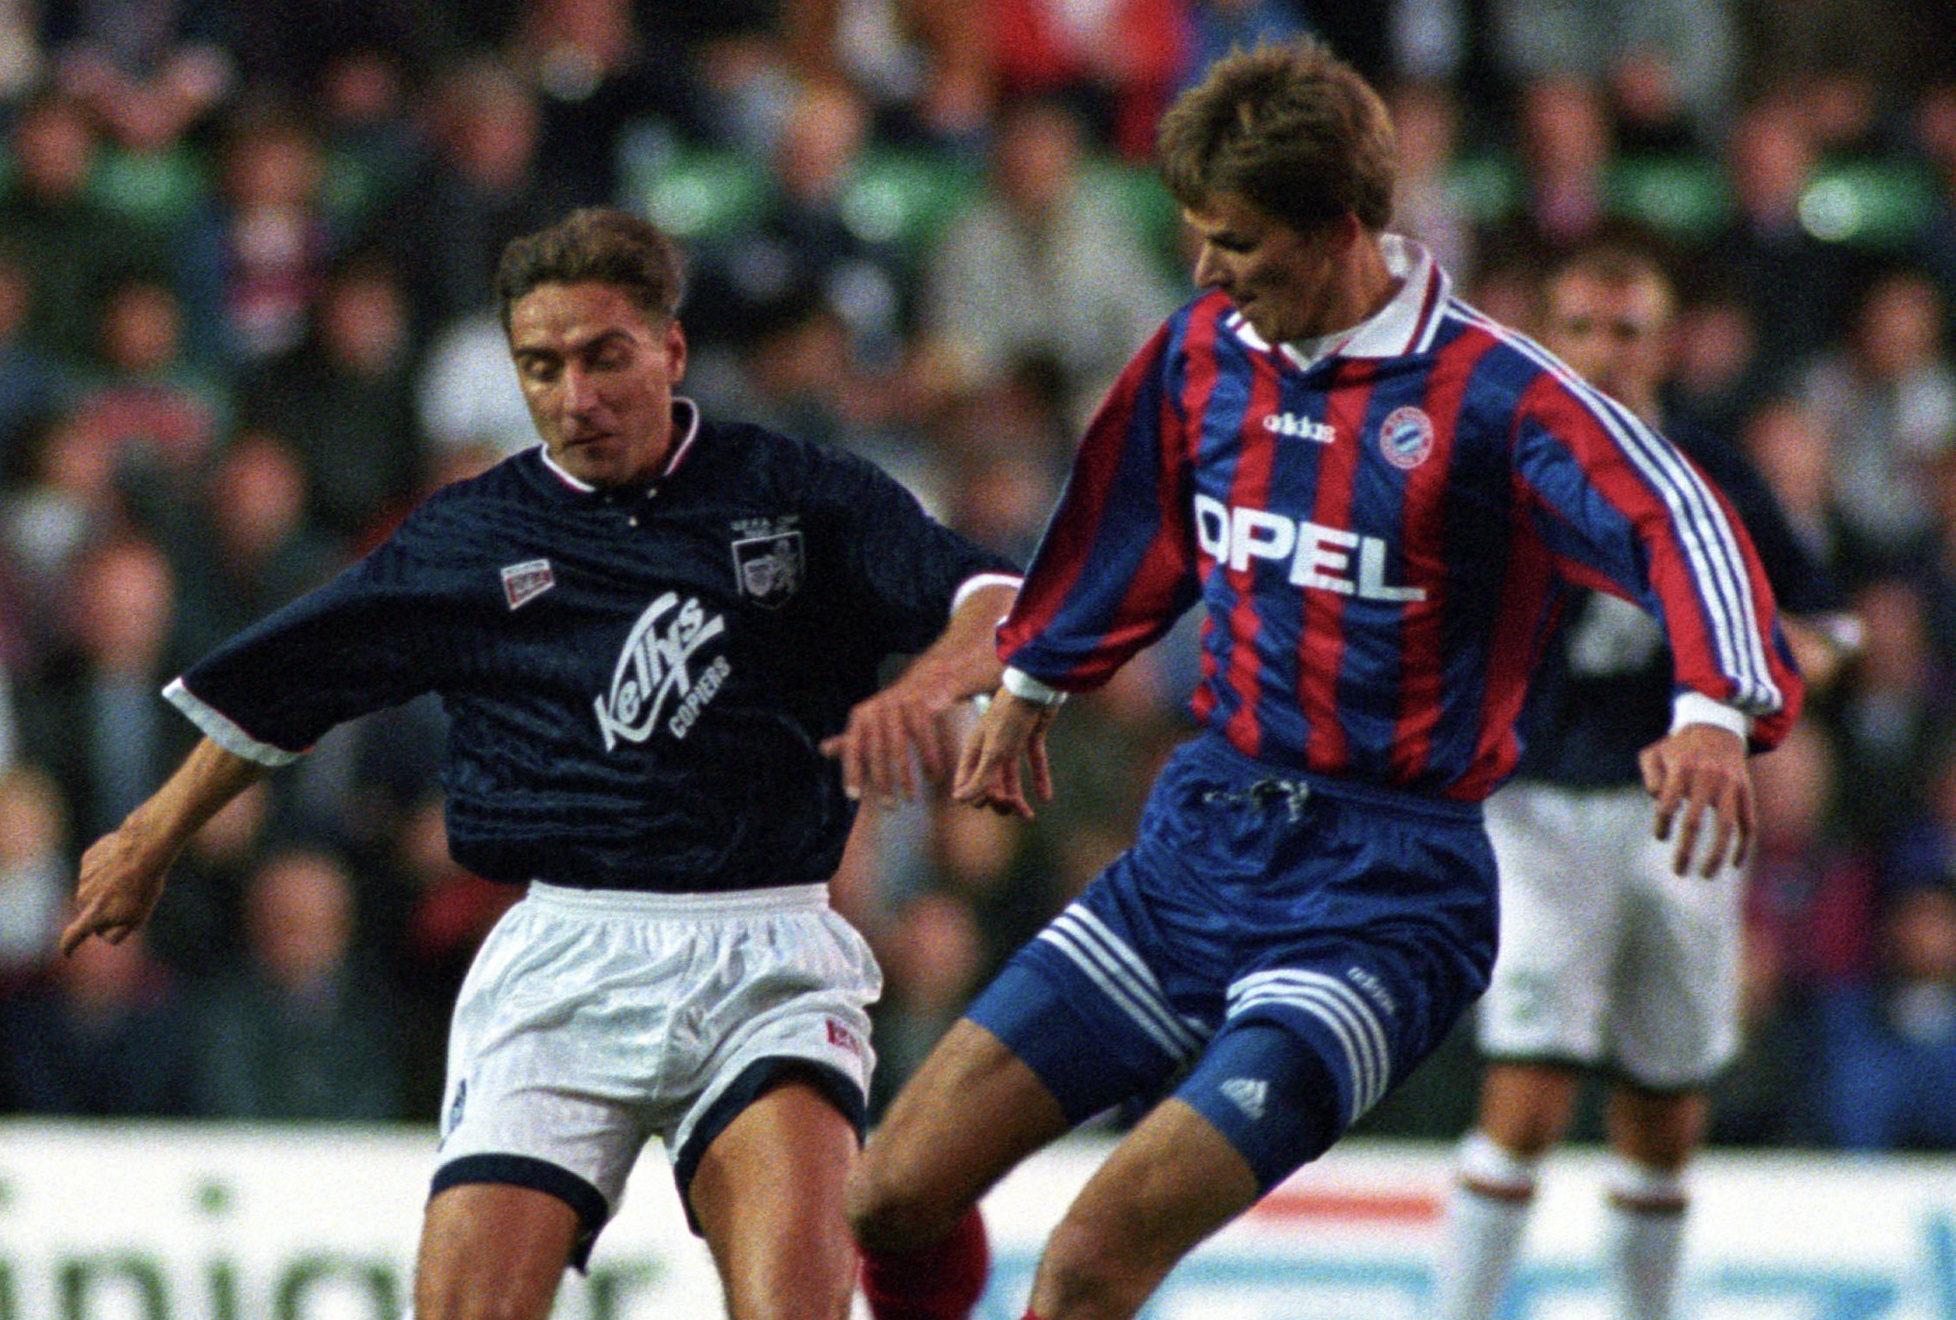 Raith's Jim McInally, left, battles for the ball with  Dietmar Hamann of Bayern Munich.